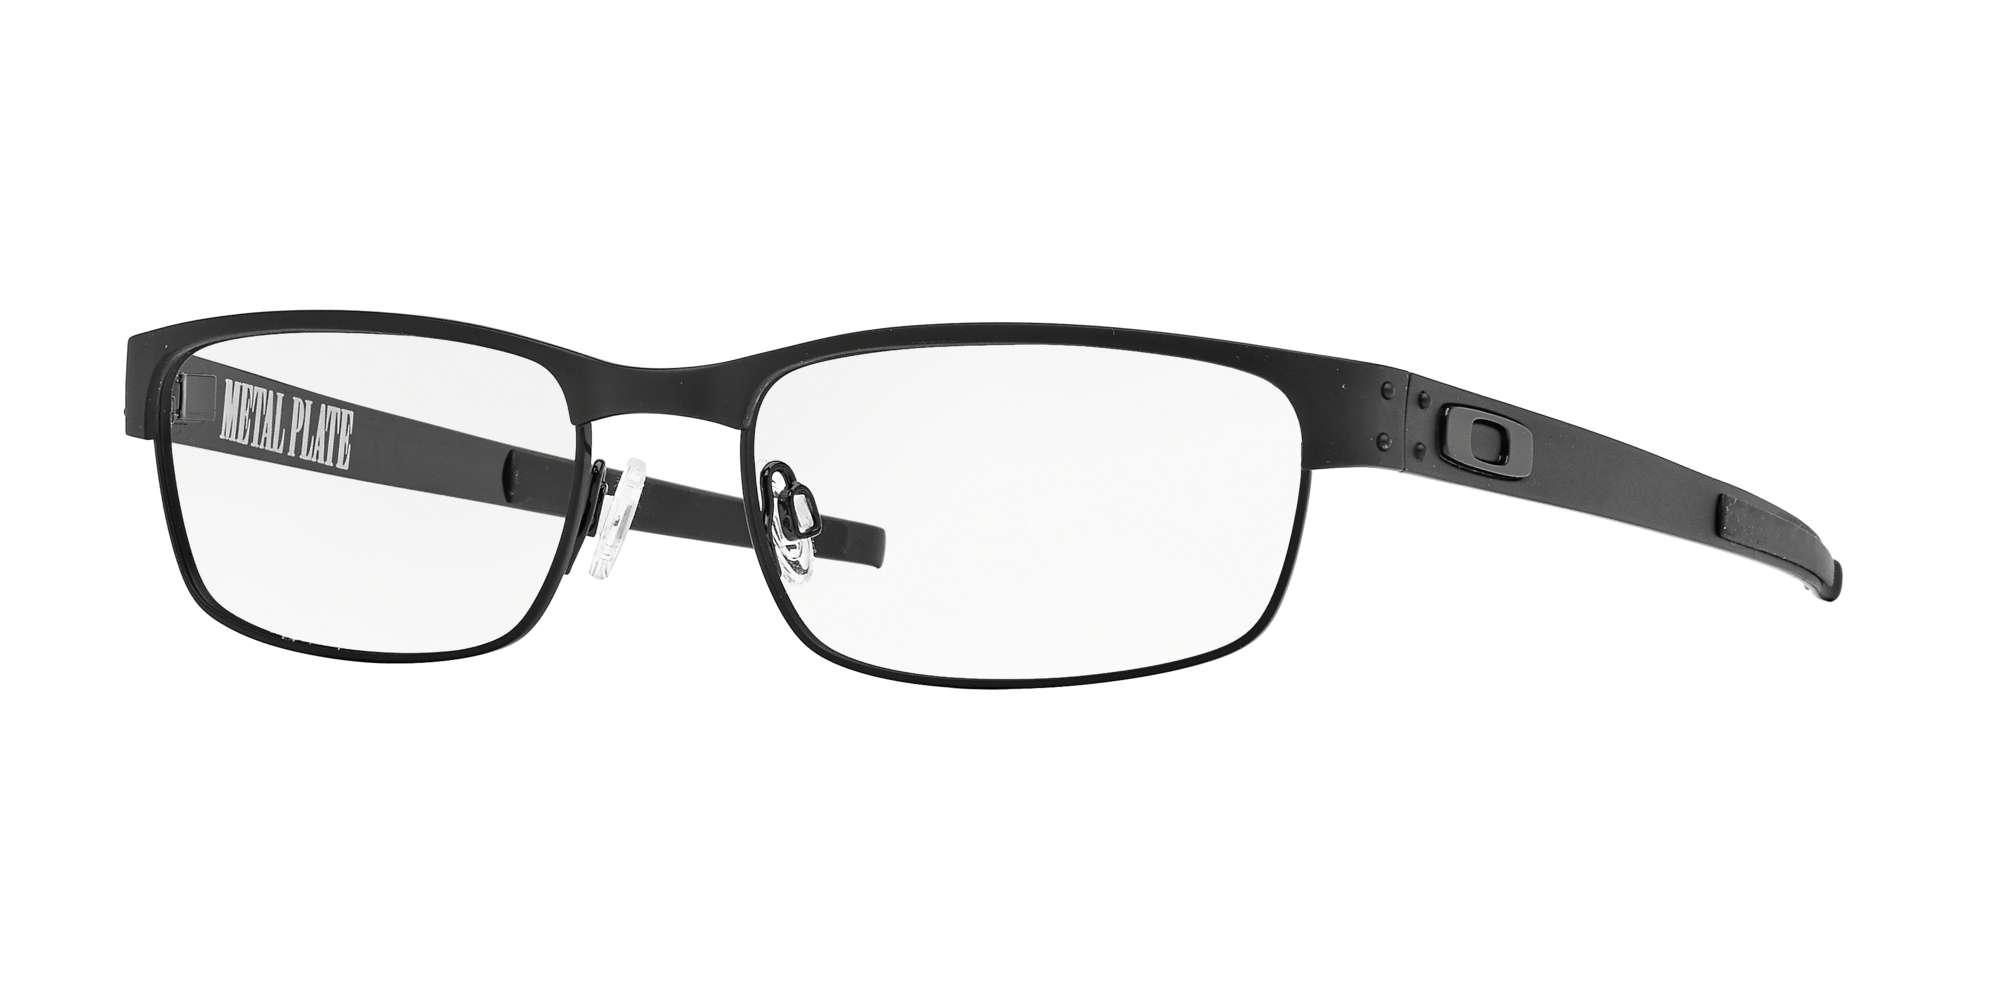 MATTE BLACK / CLEAR lenses